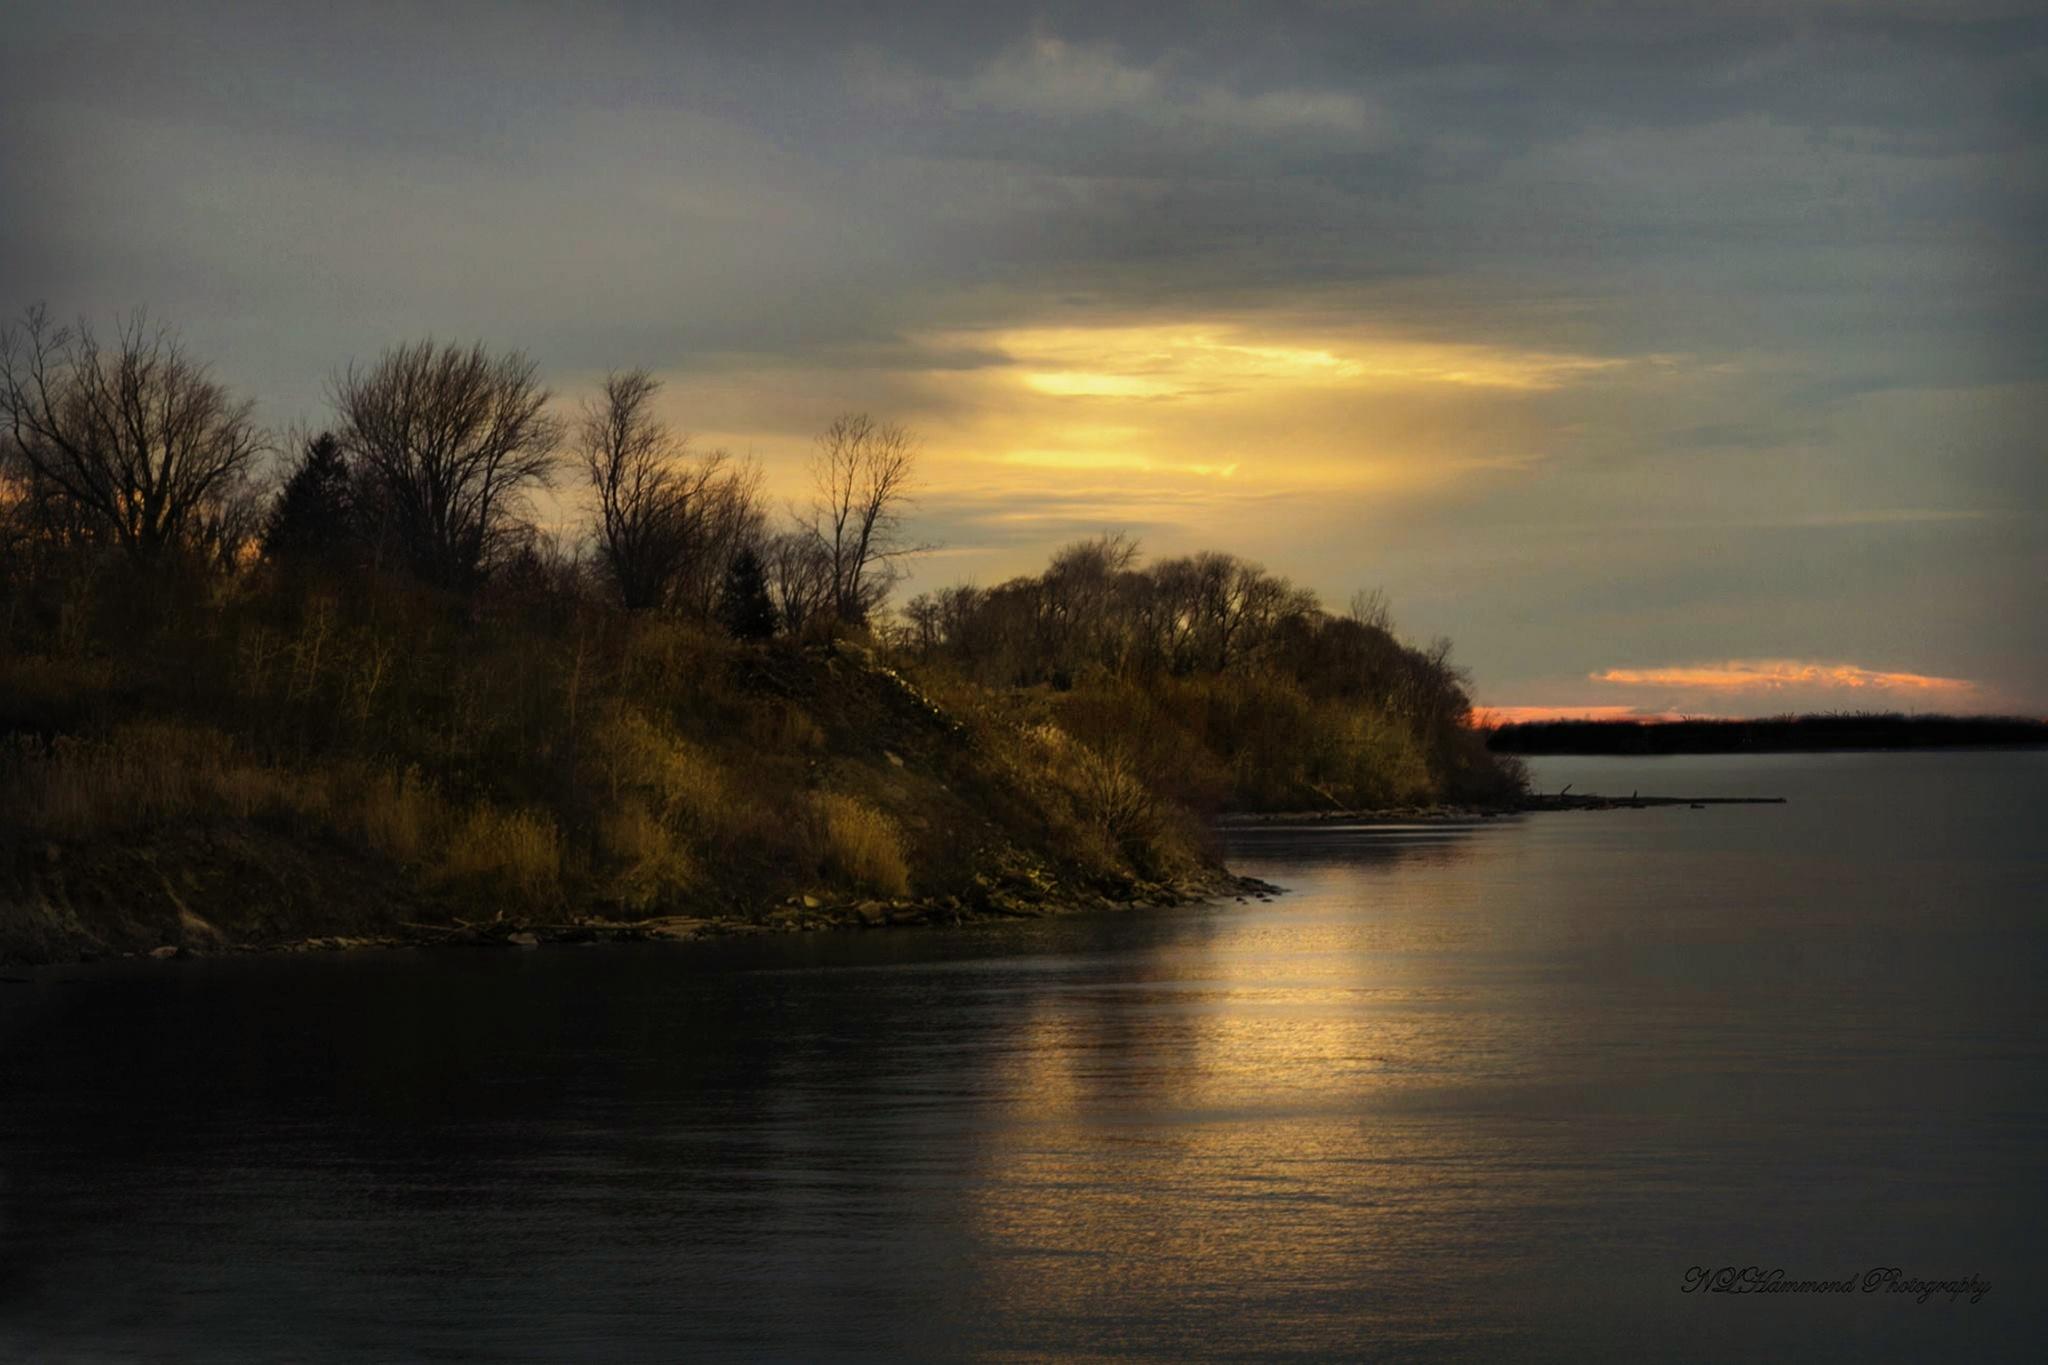 El Niño Winter in Ohio by NLHammondPhotography